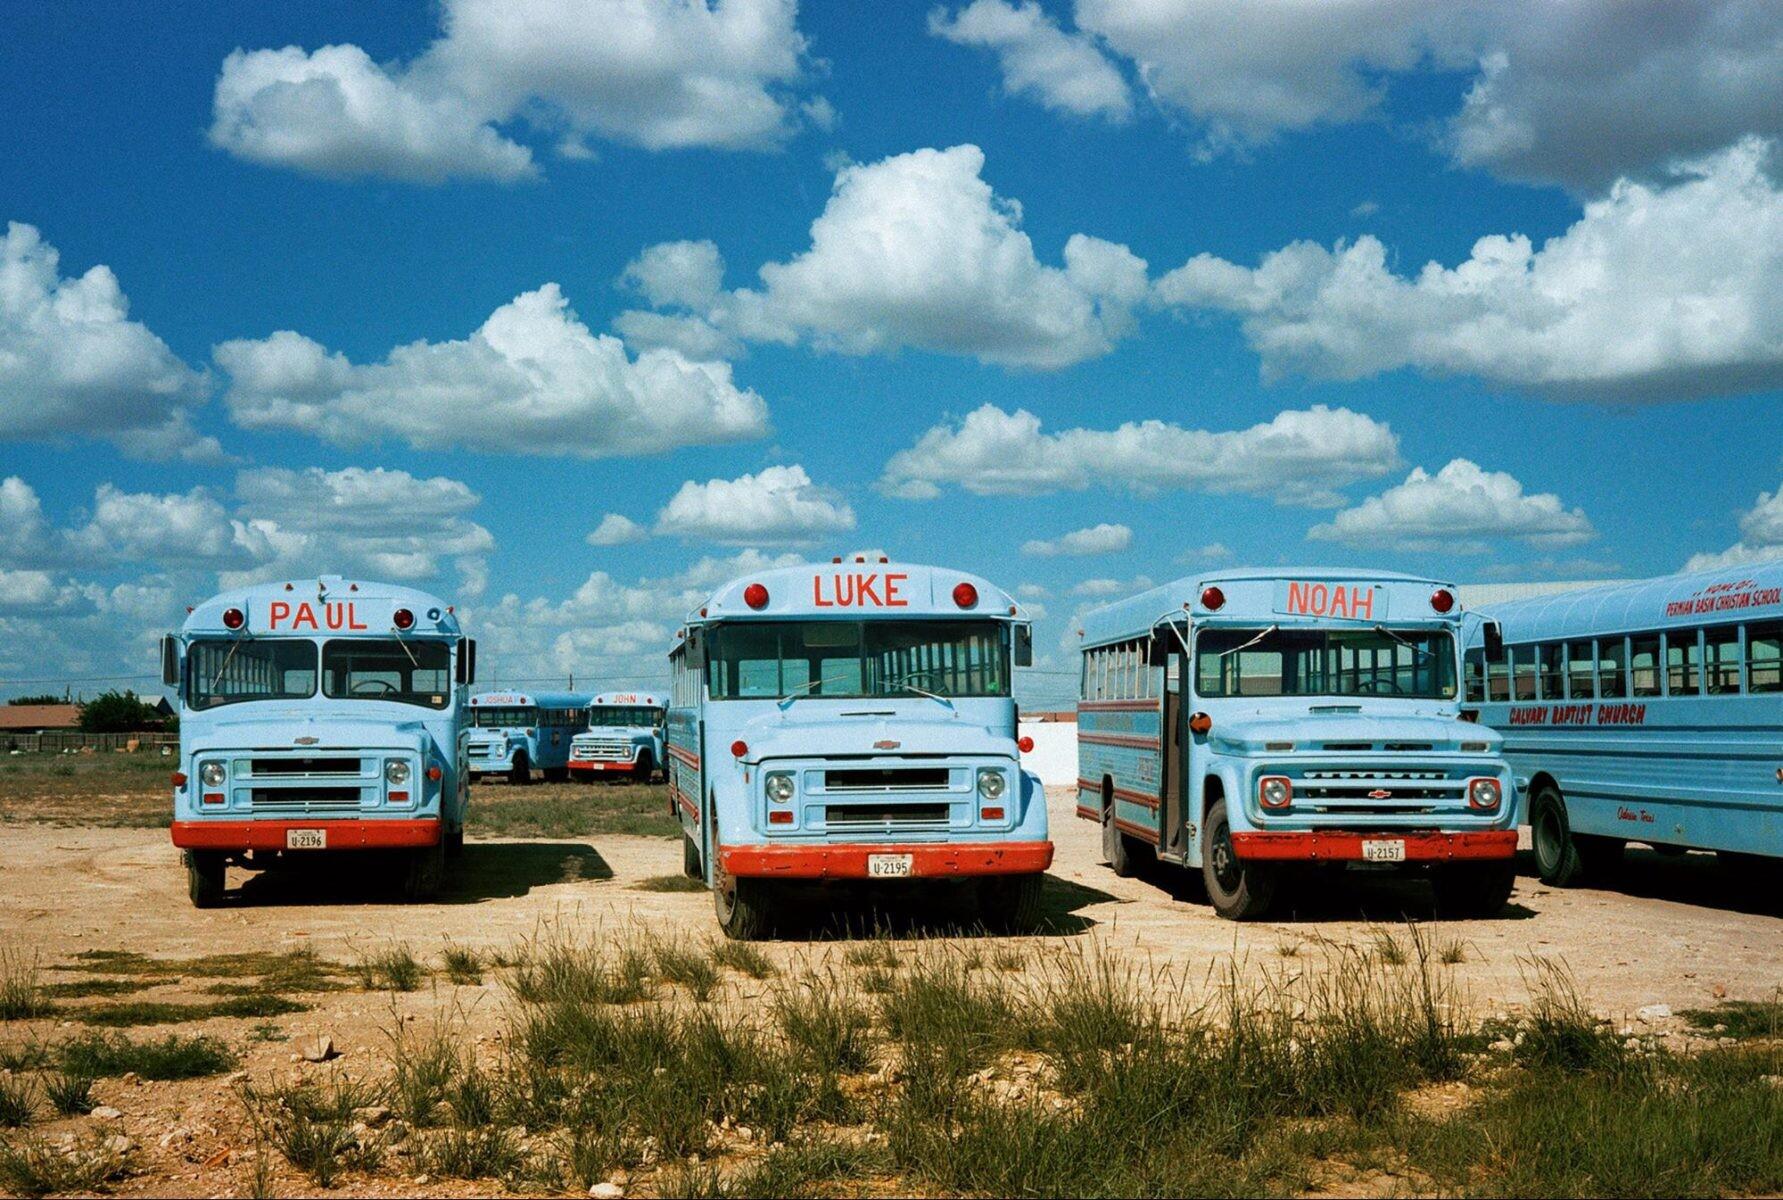 Одесса, Техас, 1983. Фотограф Вим Вендерс